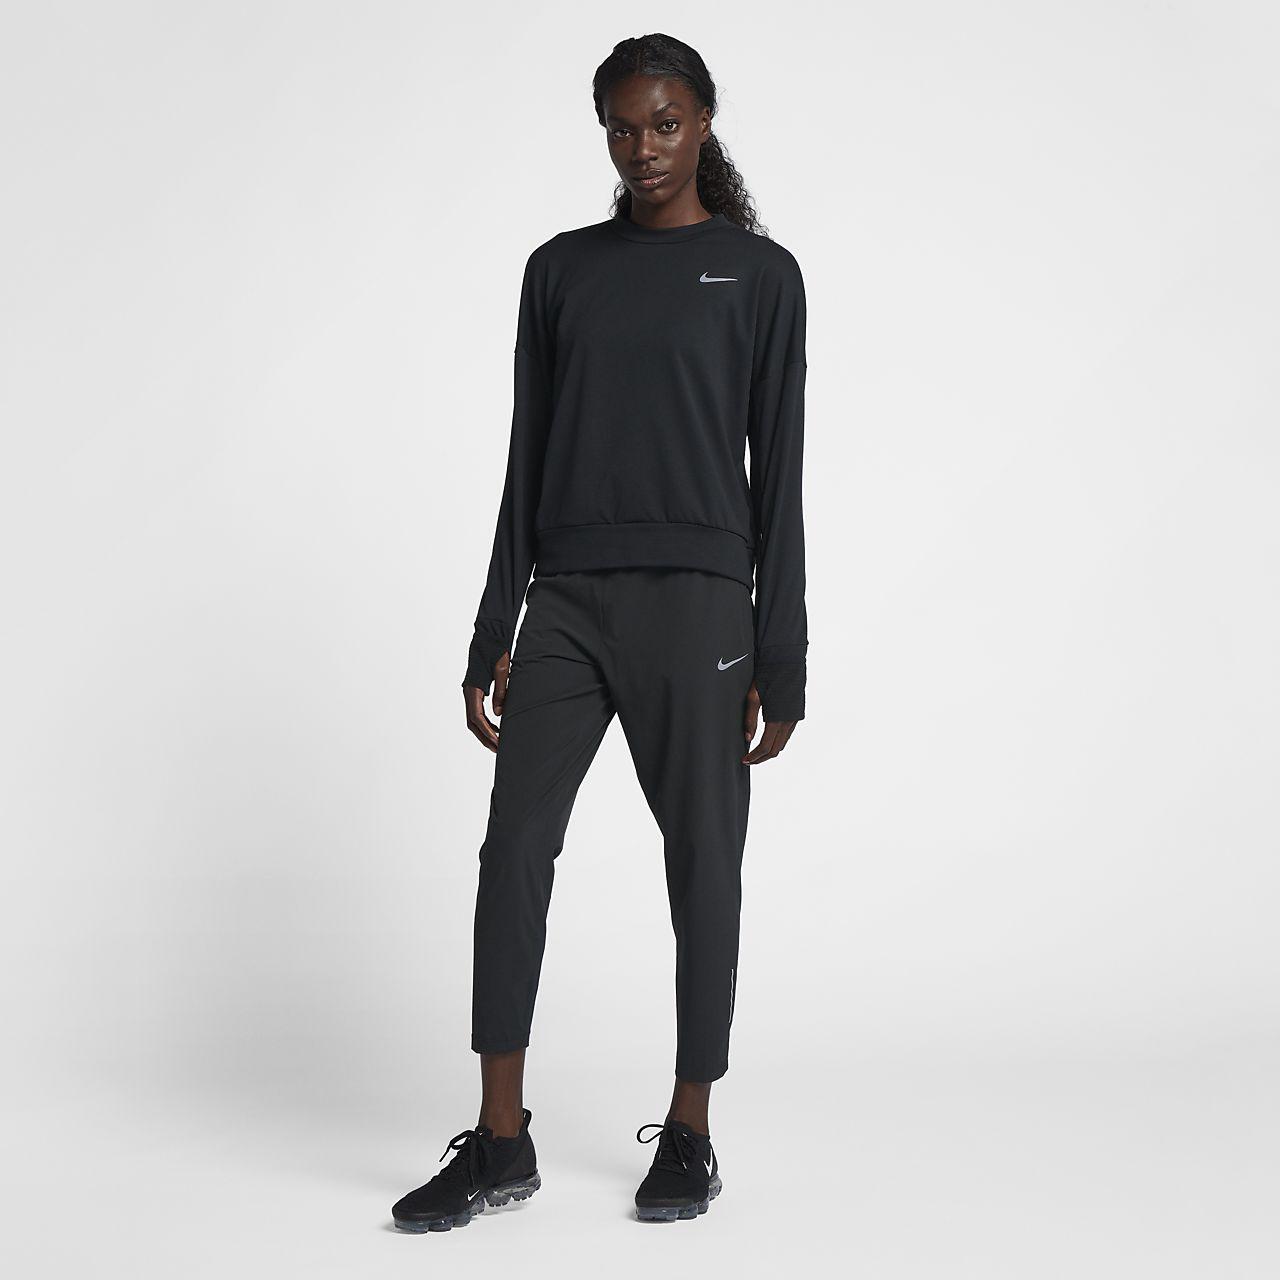 3f55deac Nike Therma Sphere Element Women's Running Top. Nike.com